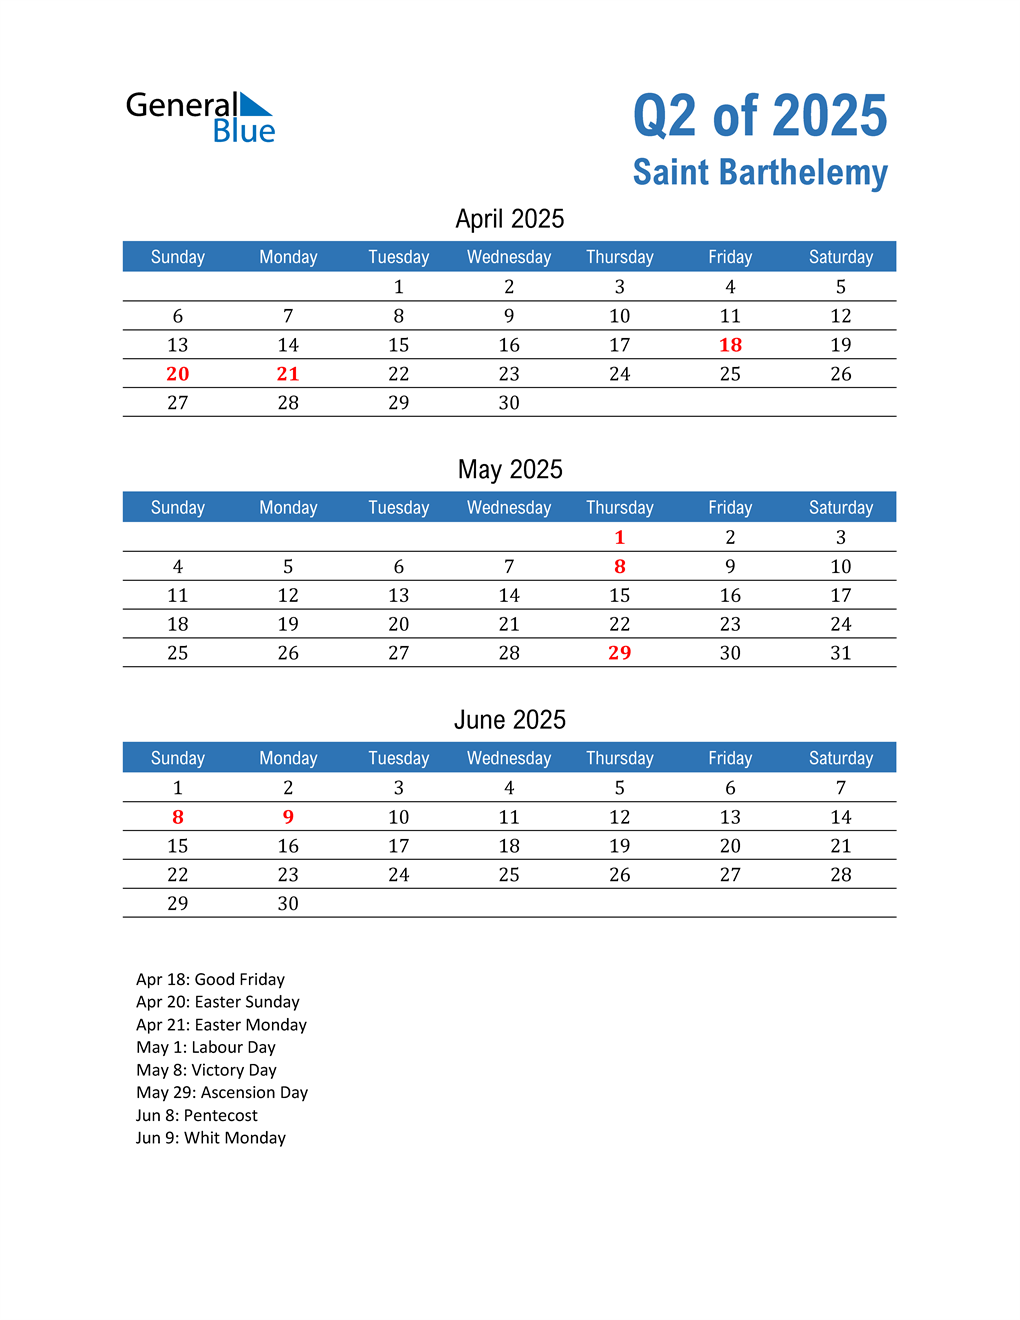 Saint Barthelemy 2025 Quarterly Calendar